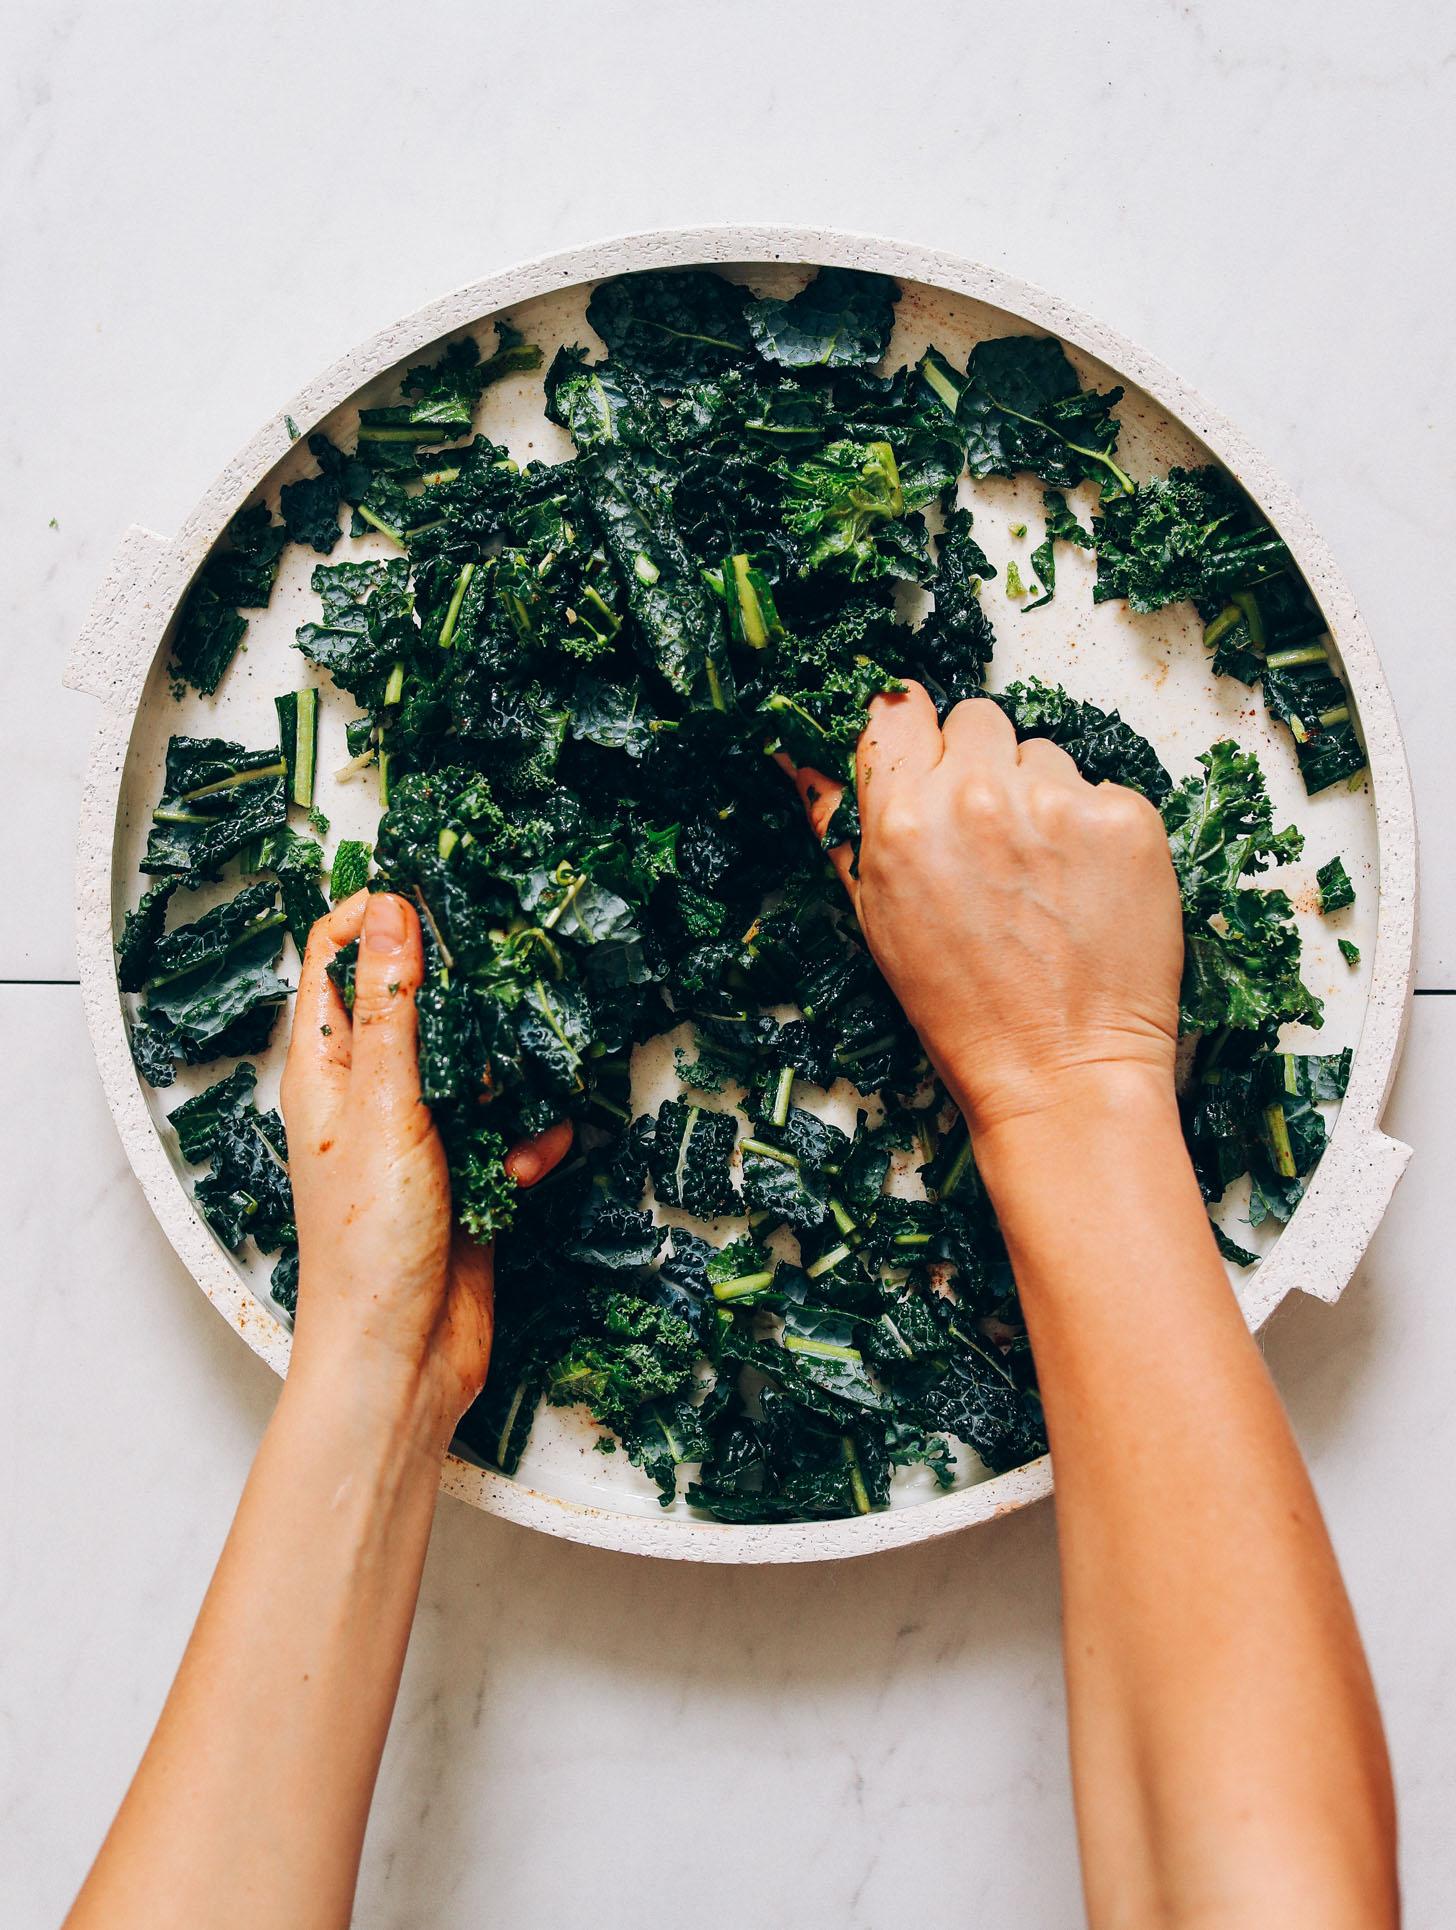 Massaging lacinato kale on a platter